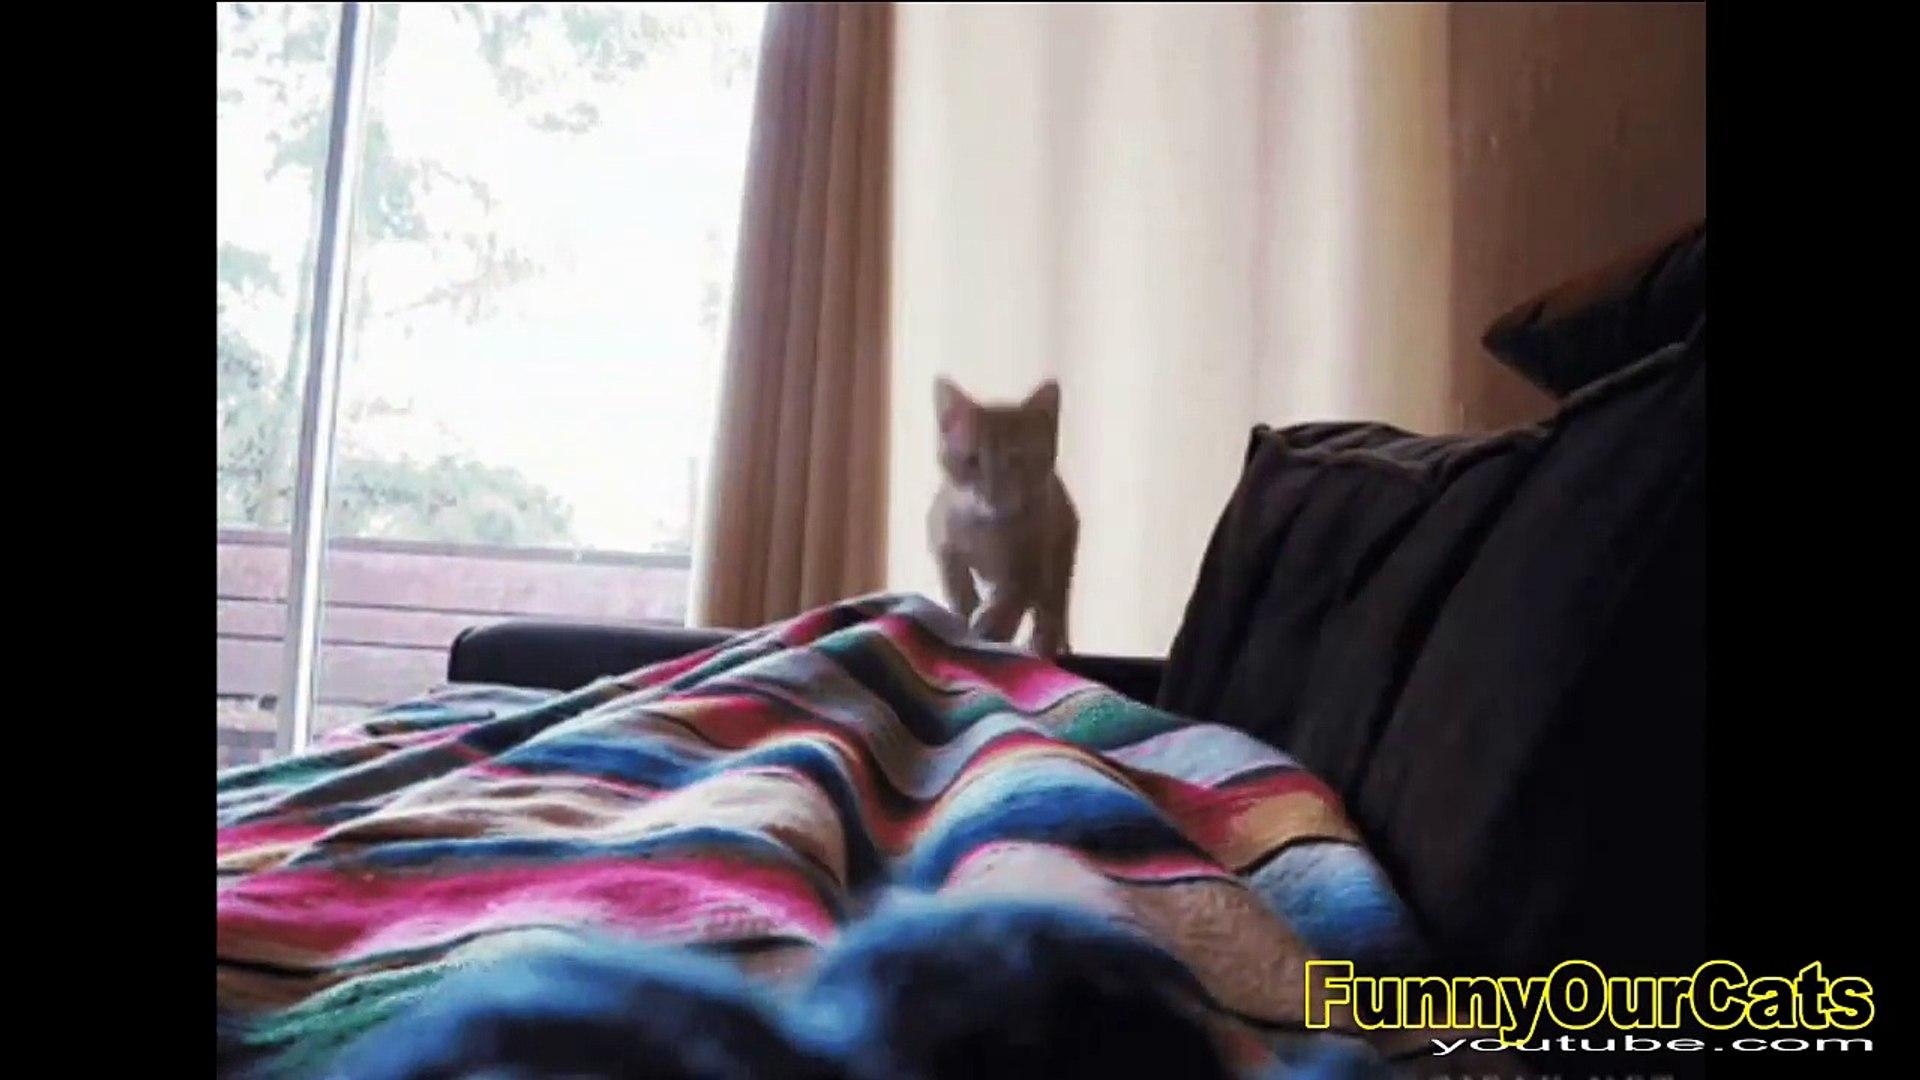 Cute Funny Cats Videos & Music & COMEDY & CUTE